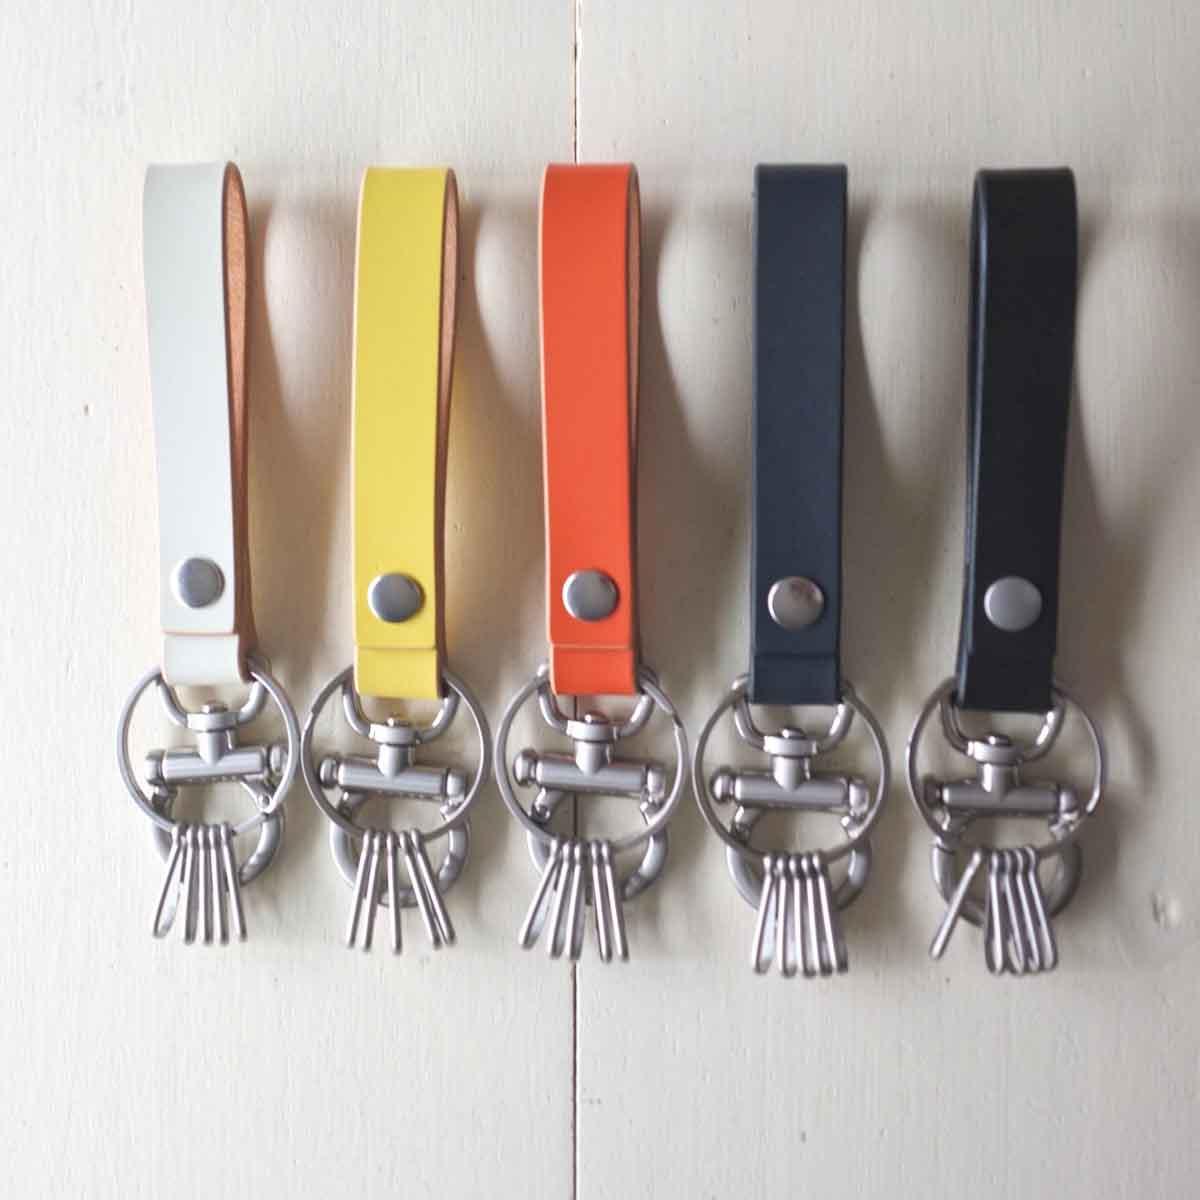 Hender Scheme エンダースキーマ key flock キーフロック 6 colors